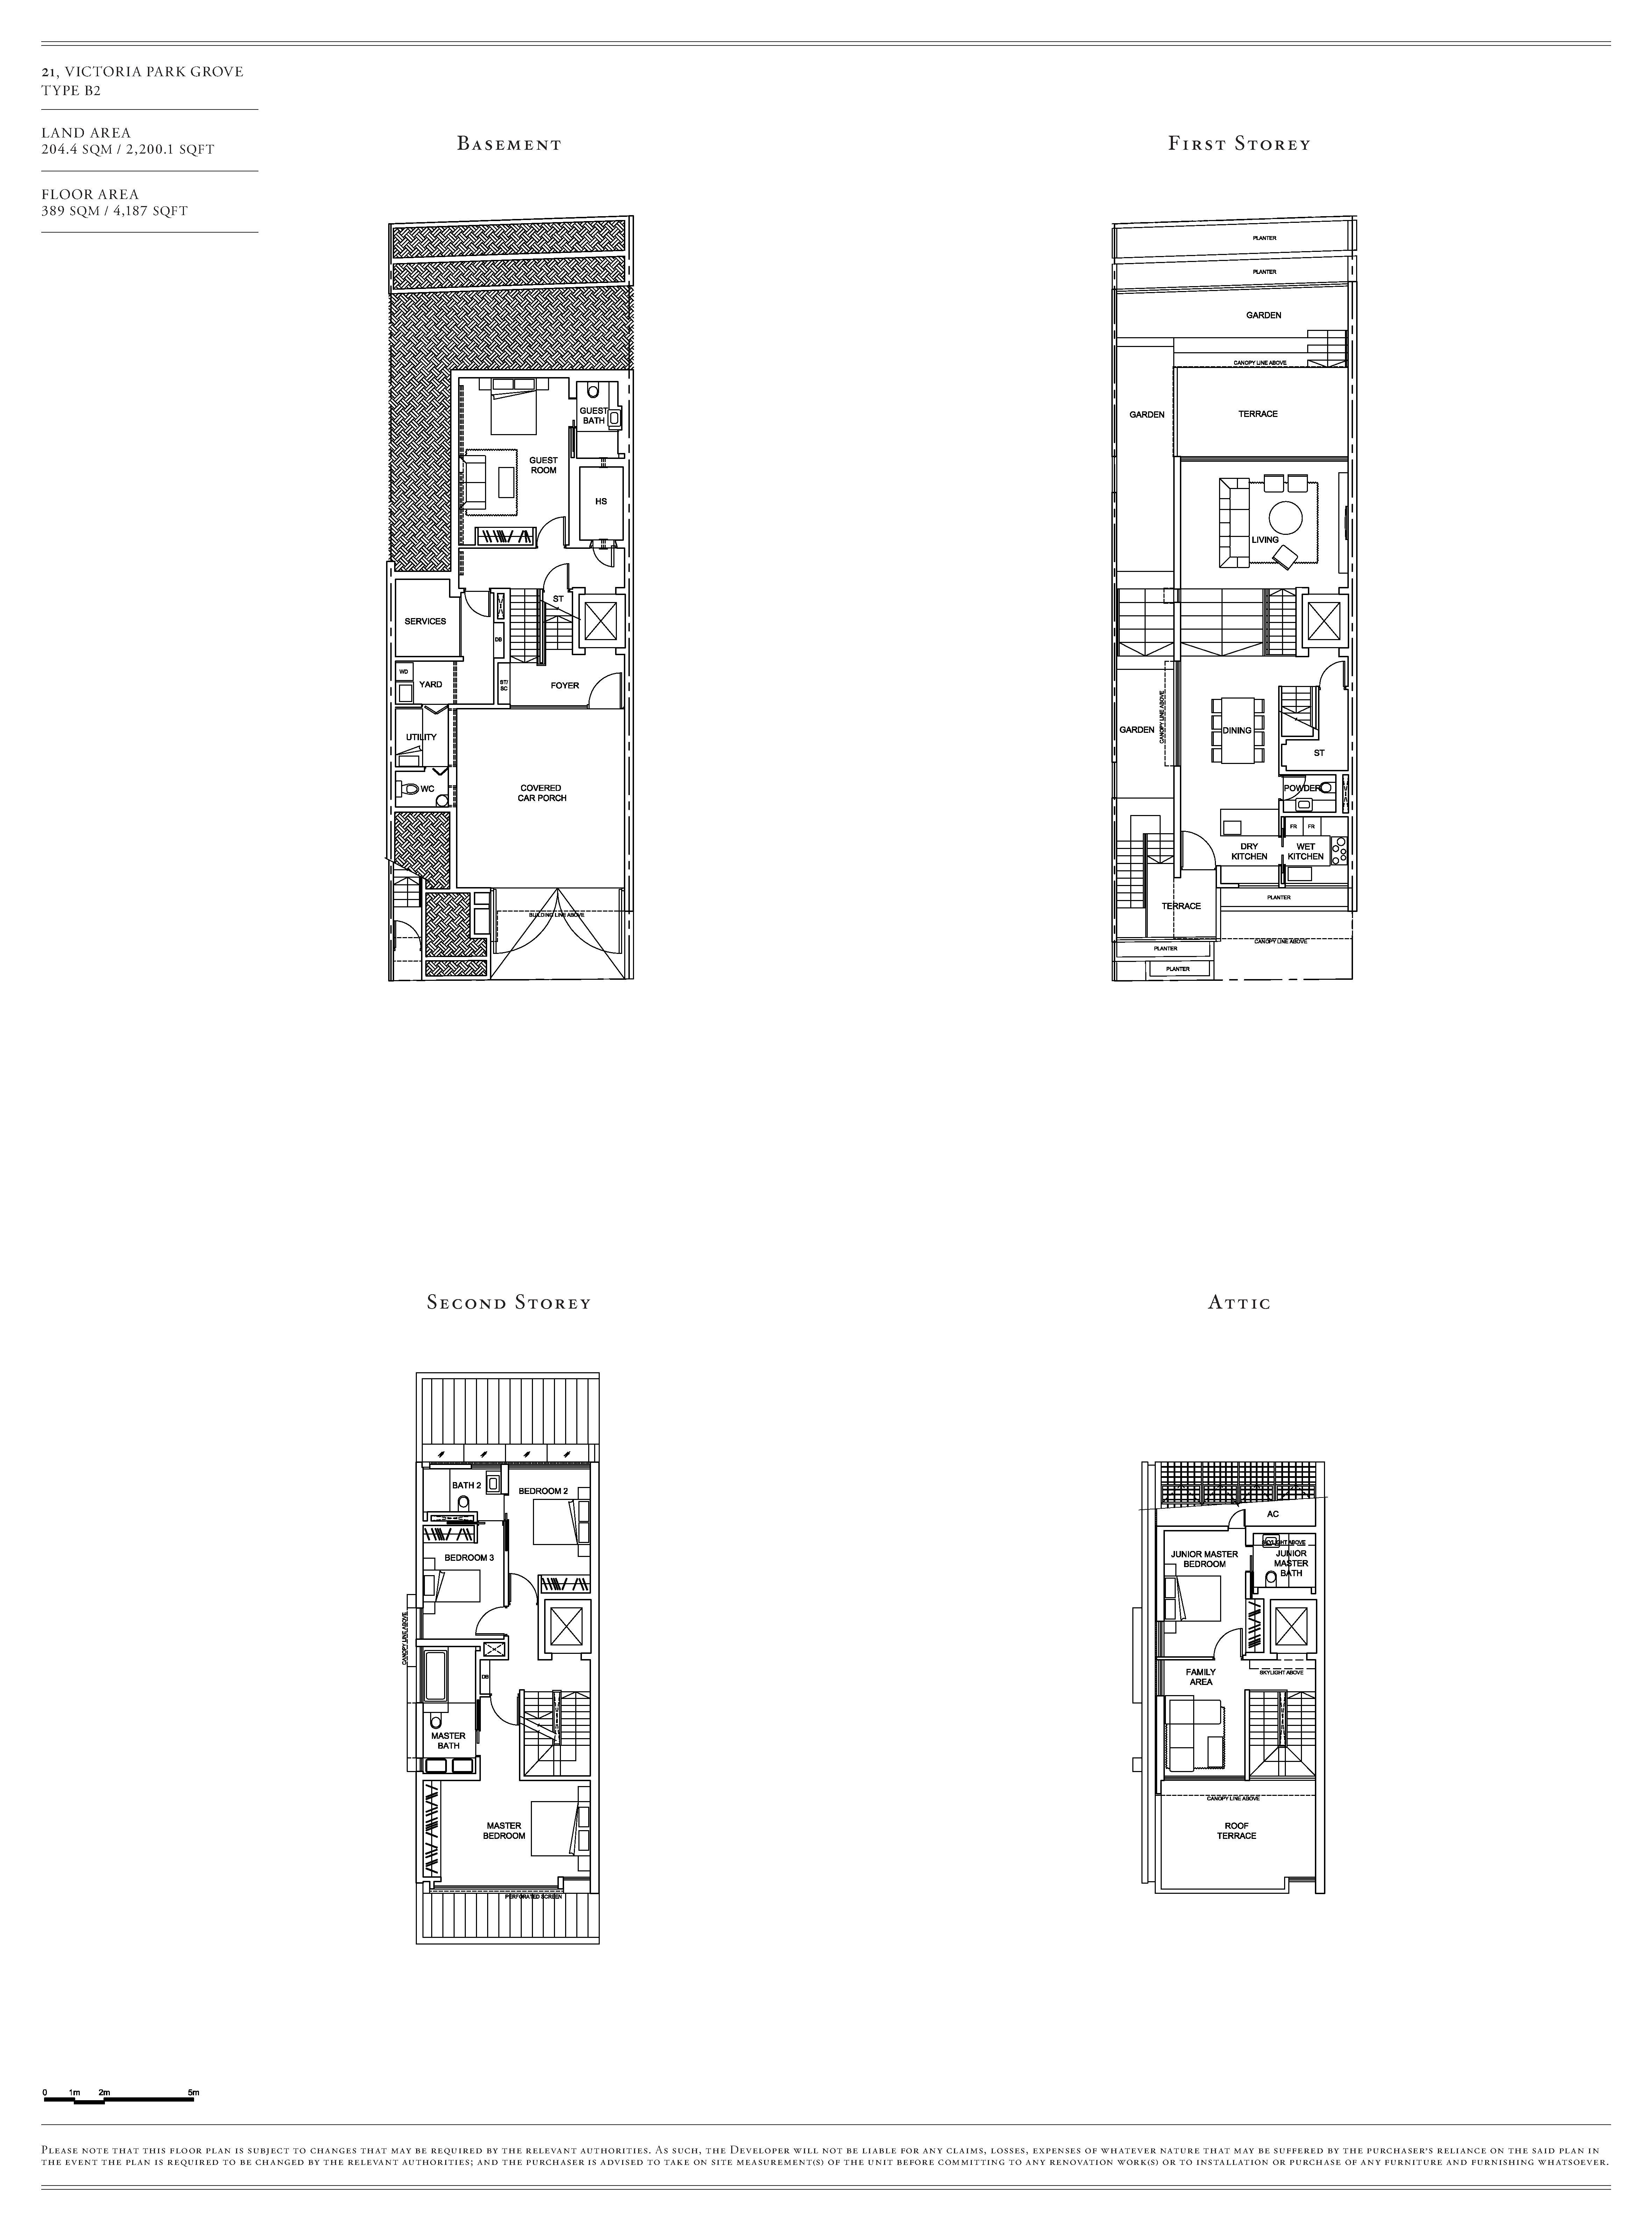 Victoria Park Villas House 21 Type B2 Floor Plans